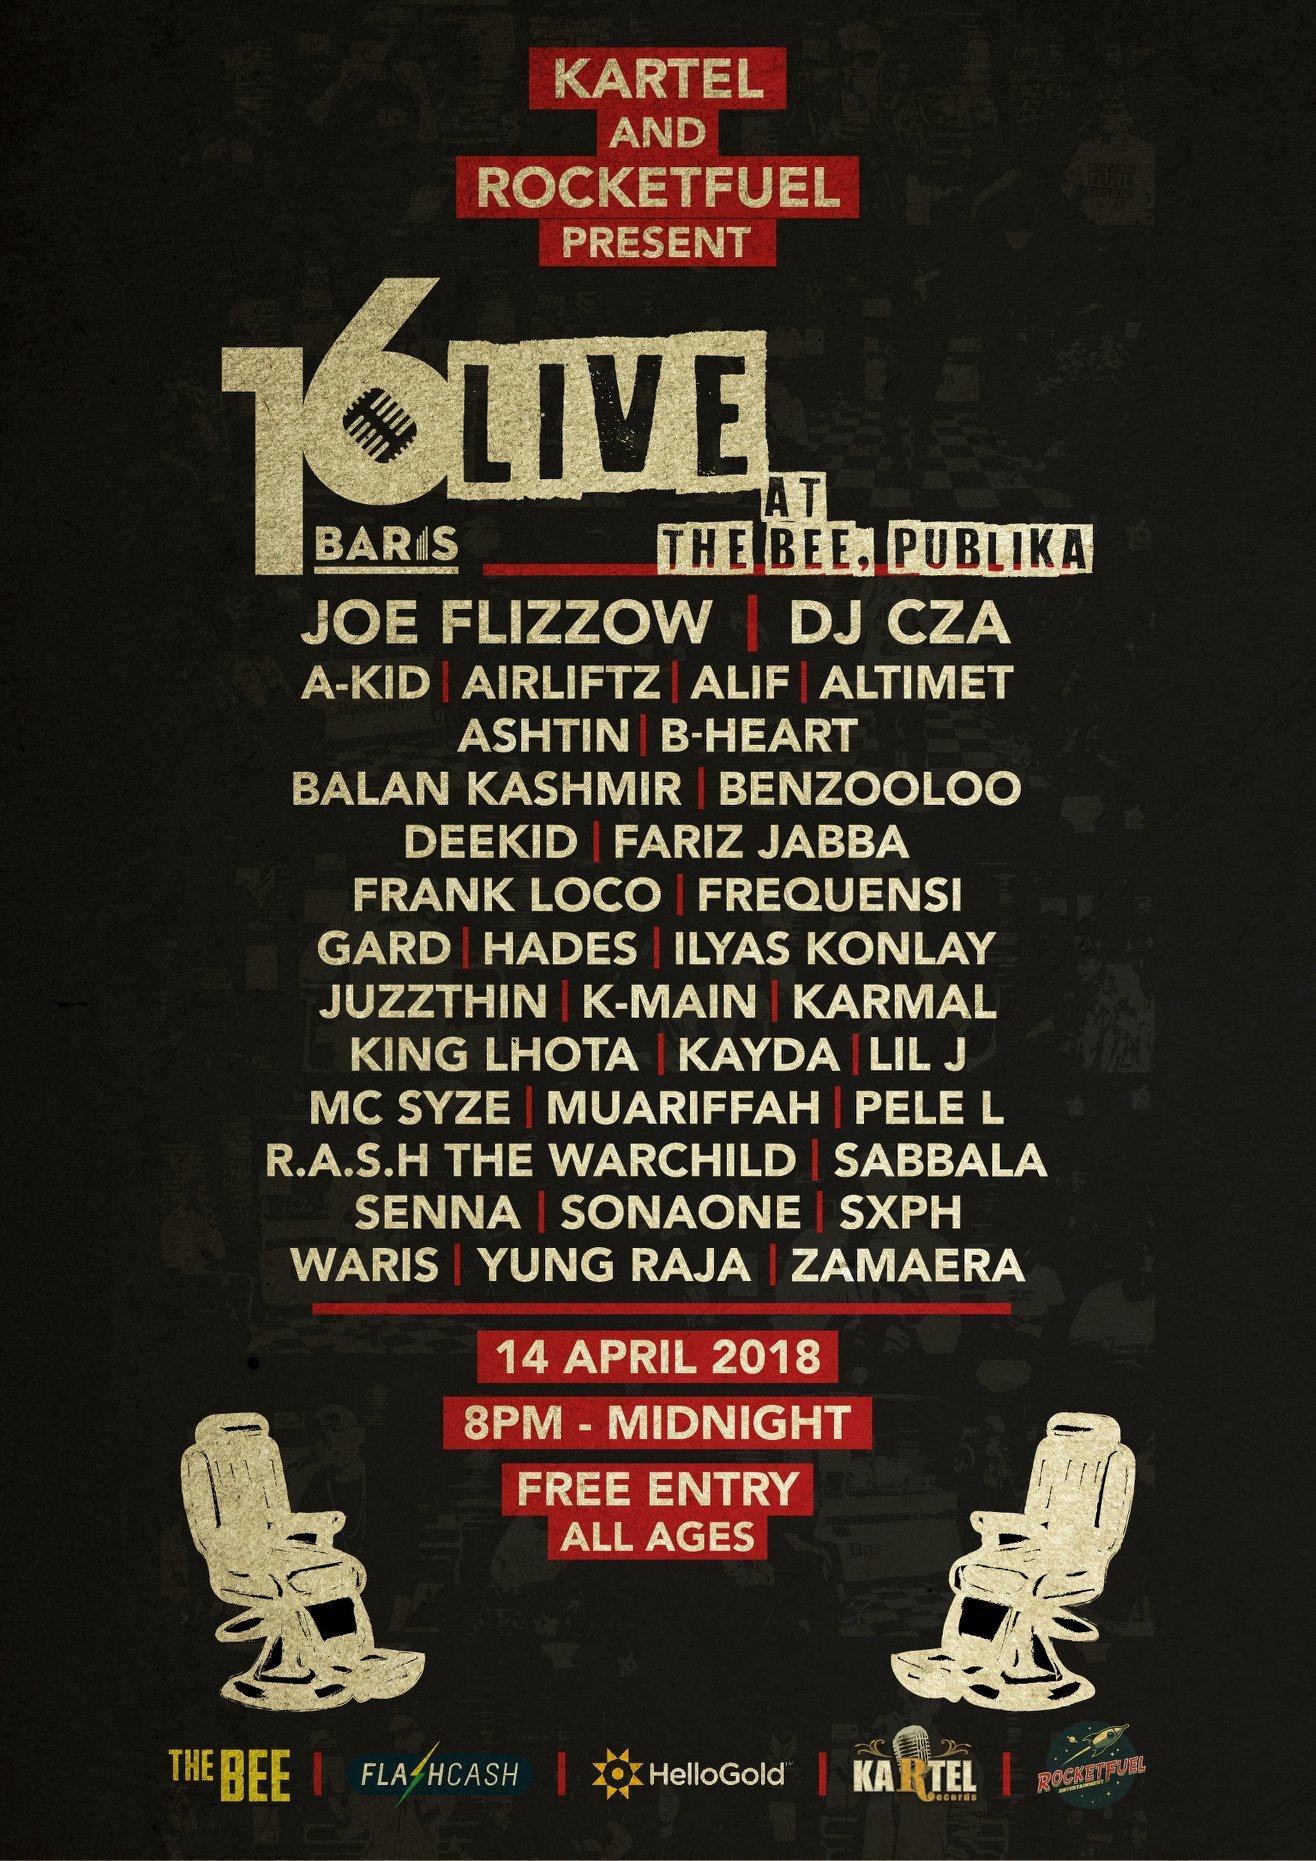 dc2b215f2ac Joe Flizzow and 16 Baris do it for Southeast Asian rap culture